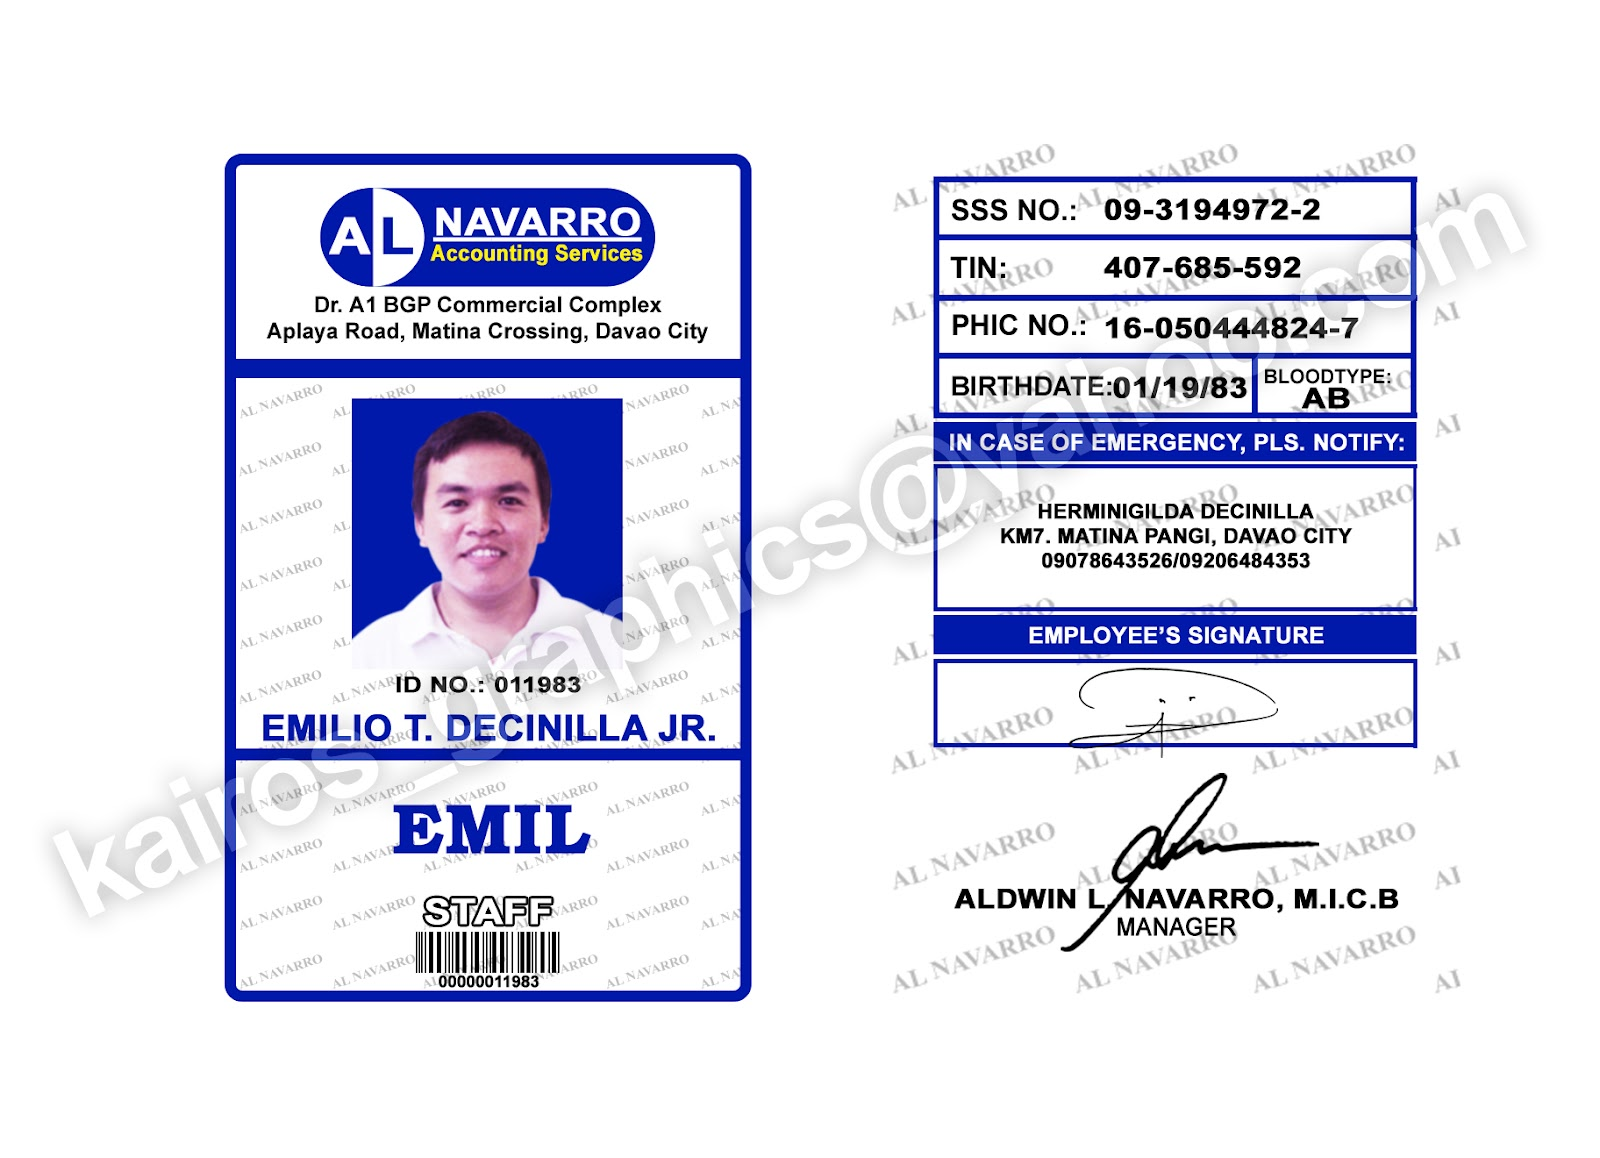 ms identification card